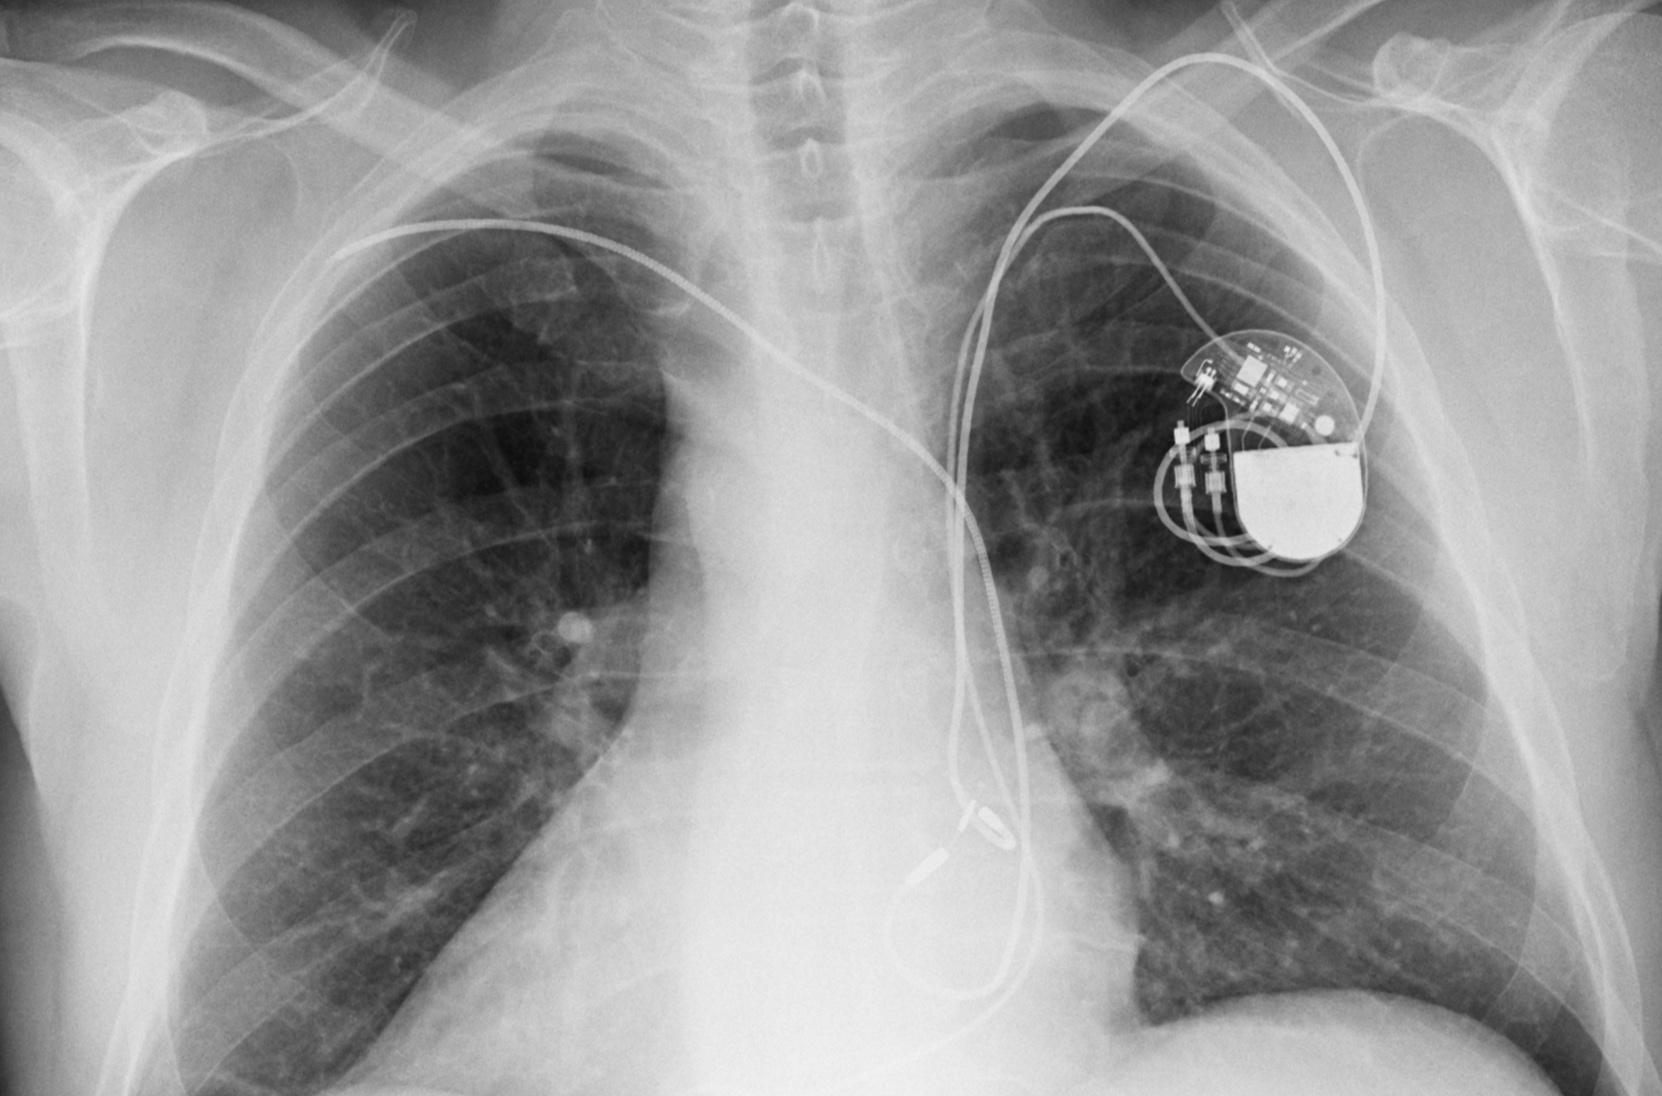 techcrunch.com - Zack Whittaker - Homeland Security warns of critical flaws in Medtronic defibrillators